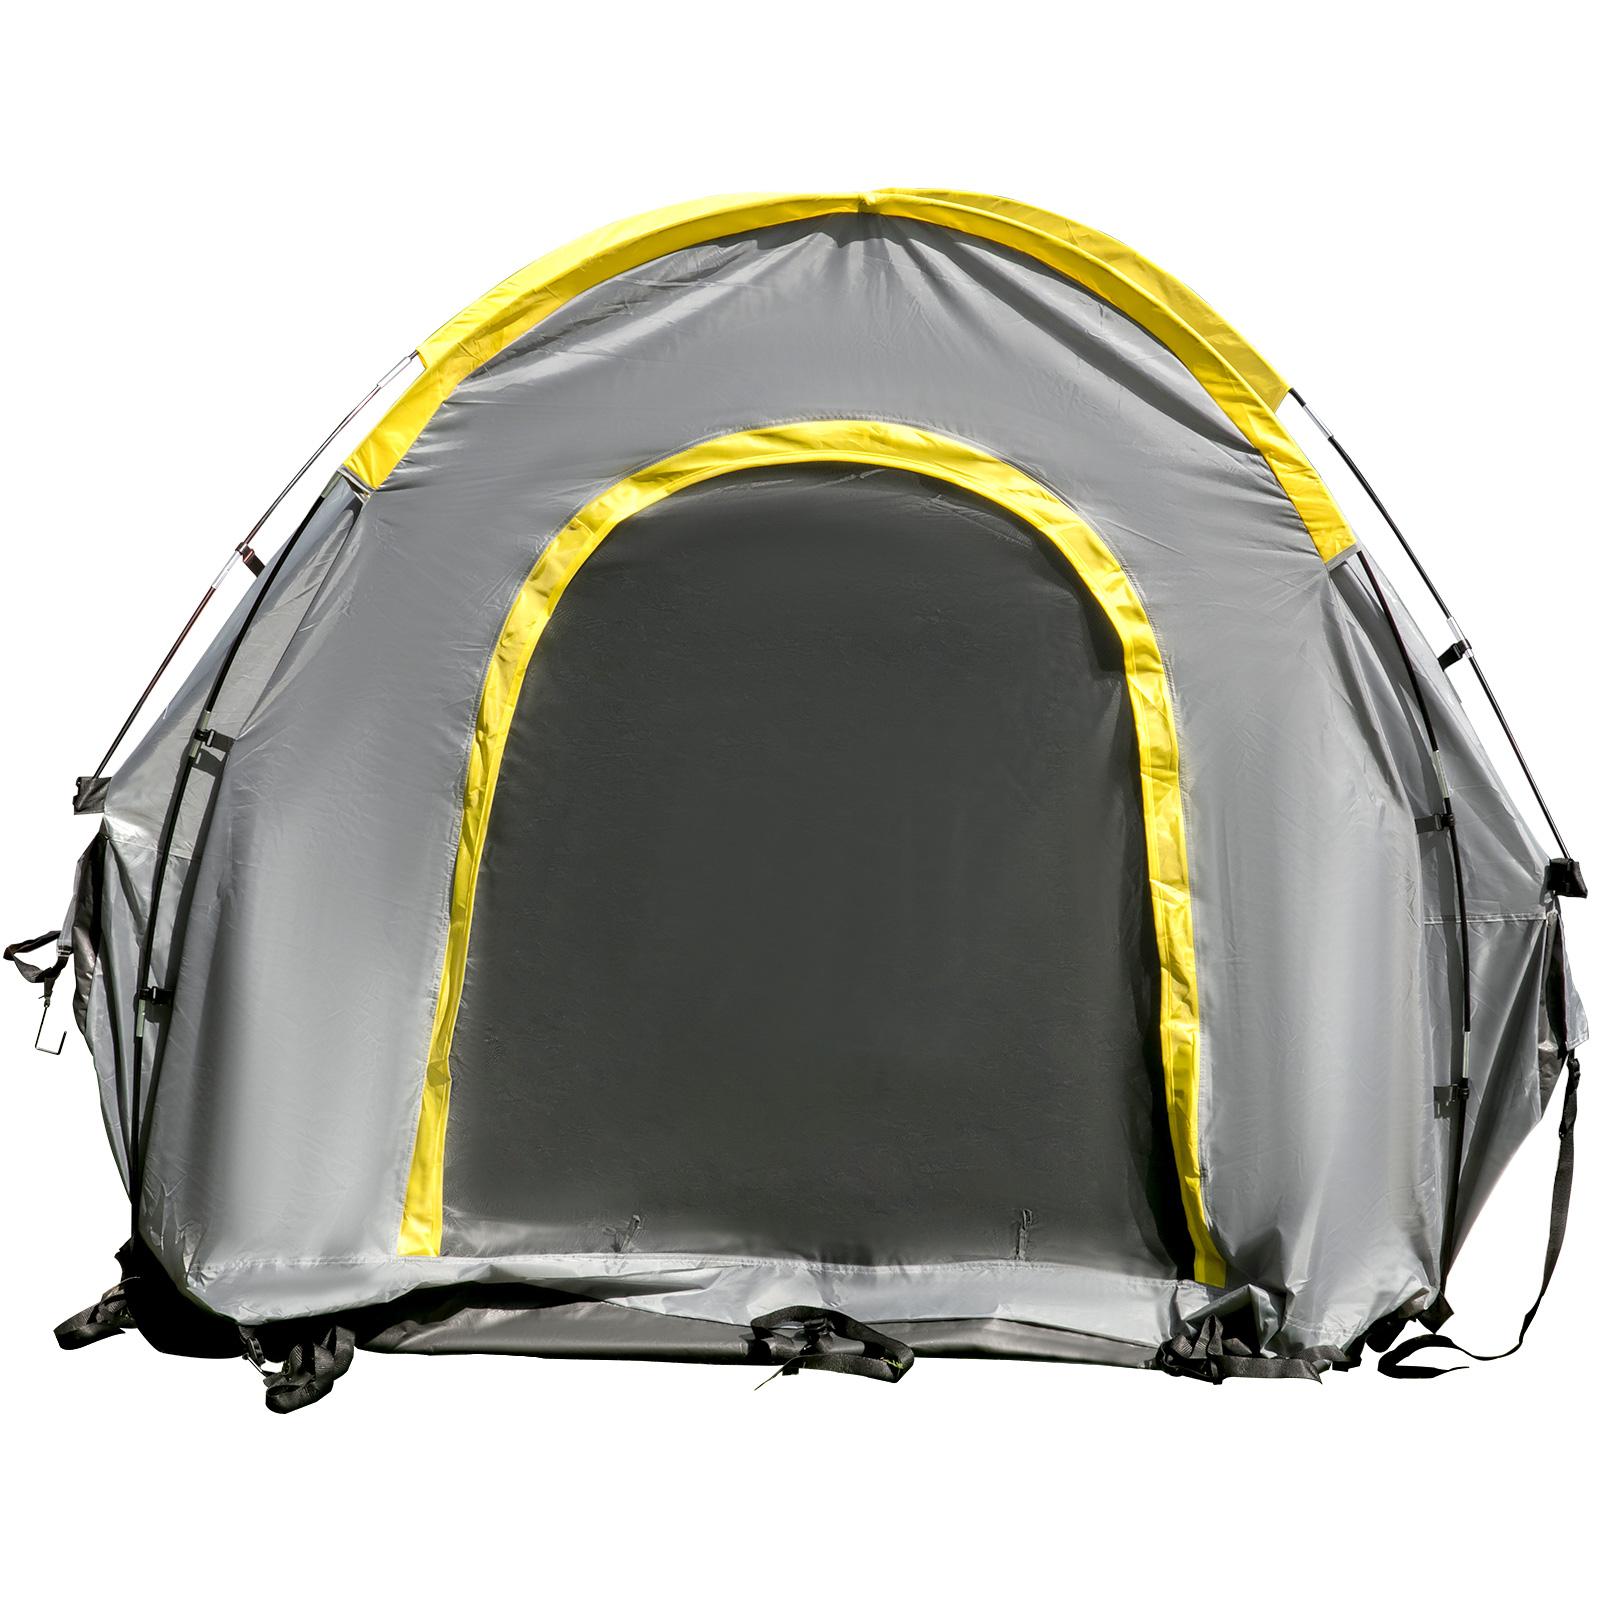 thumbnail 49 - VEVOR Truck Tent Truck Bed Tent 5' - 8' Pickup Tent Waterproof Outdoor Camping